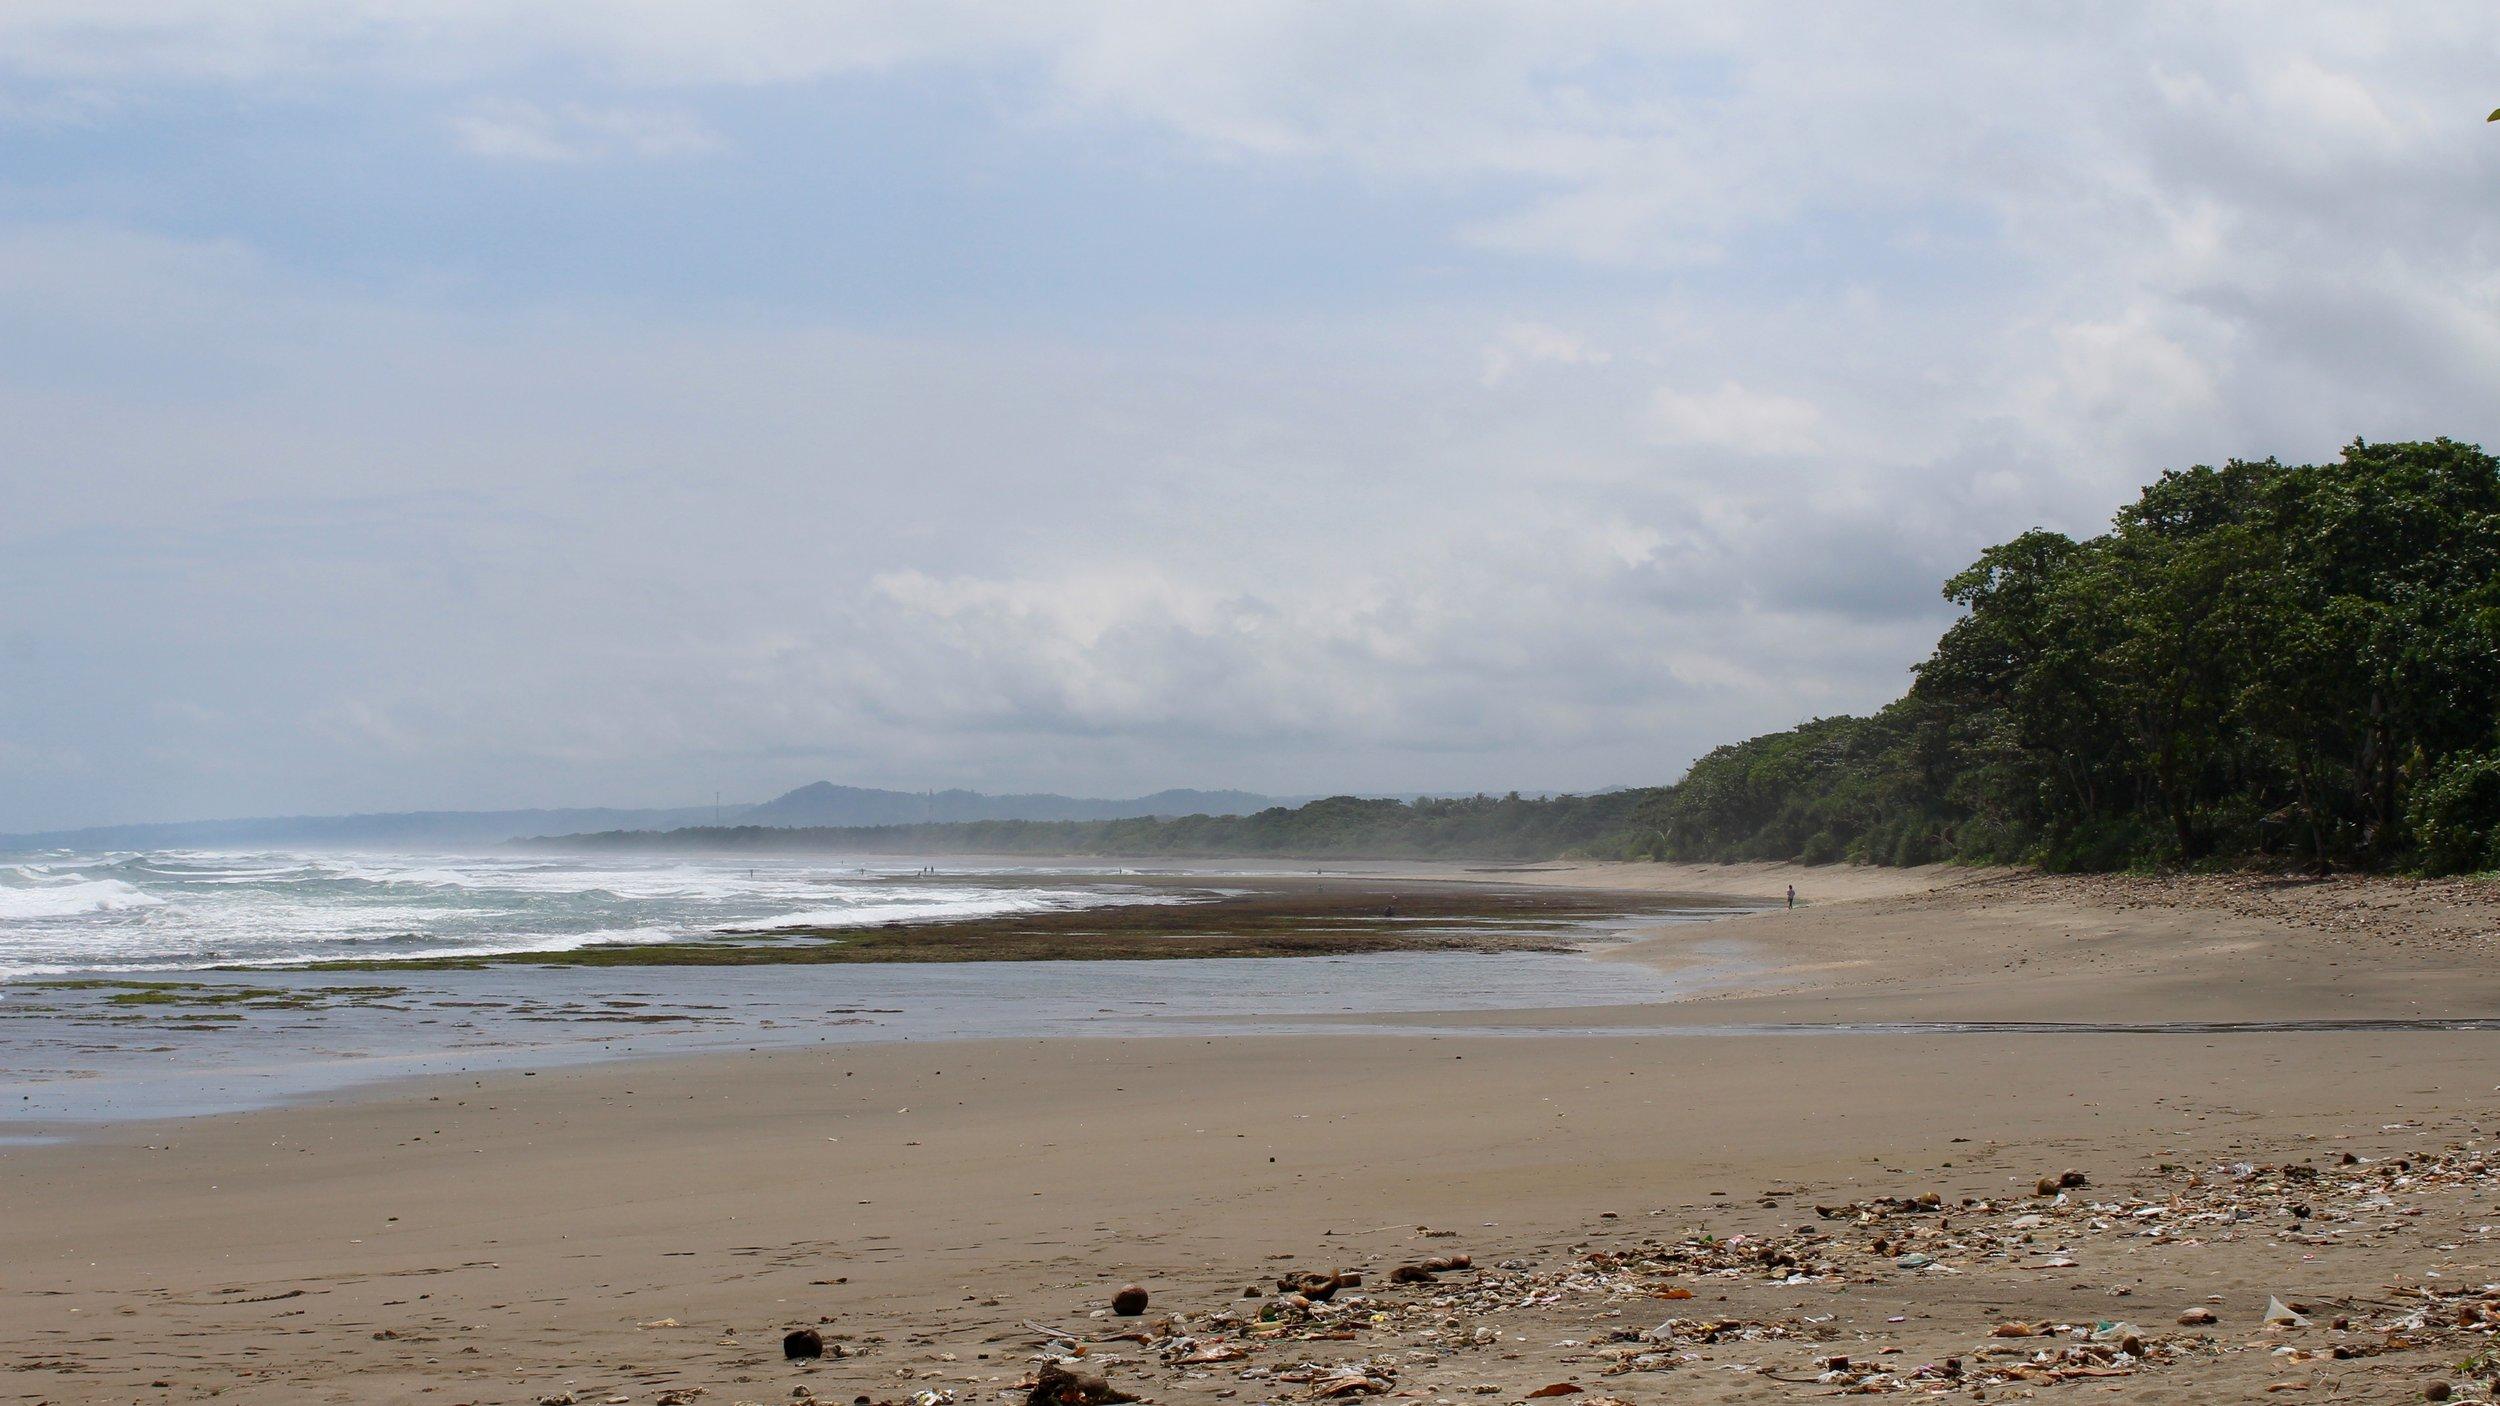 Java's desolate, somewhat trash-strewn southern coast.